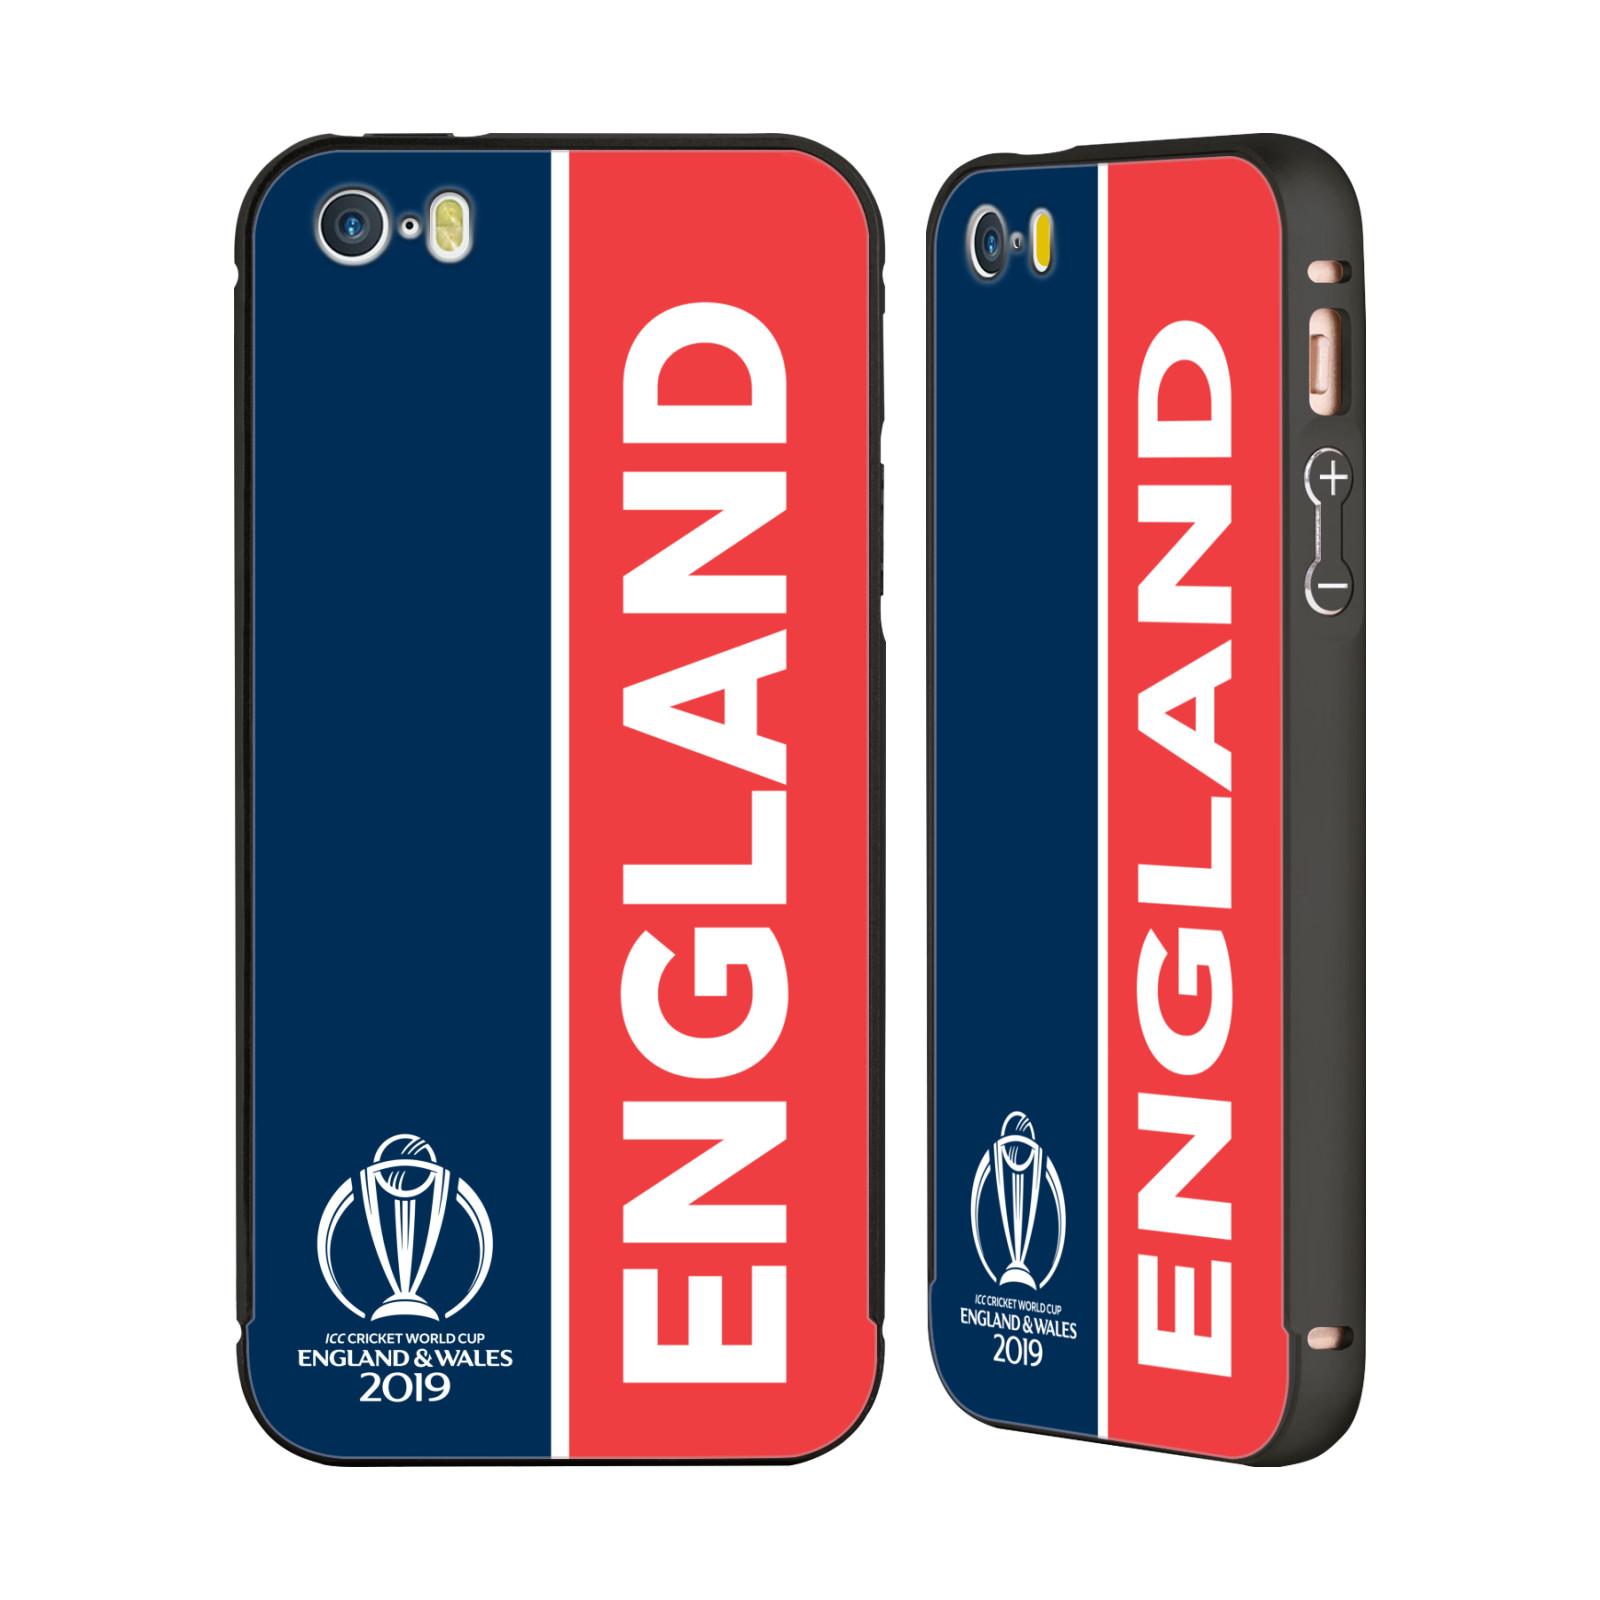 ICC-ENGLAND-CRICKET-WORLD-CUP-SCHWARZ-RAHMEN-HULLE-FUR-APPLE-iPHONE-HANDYS